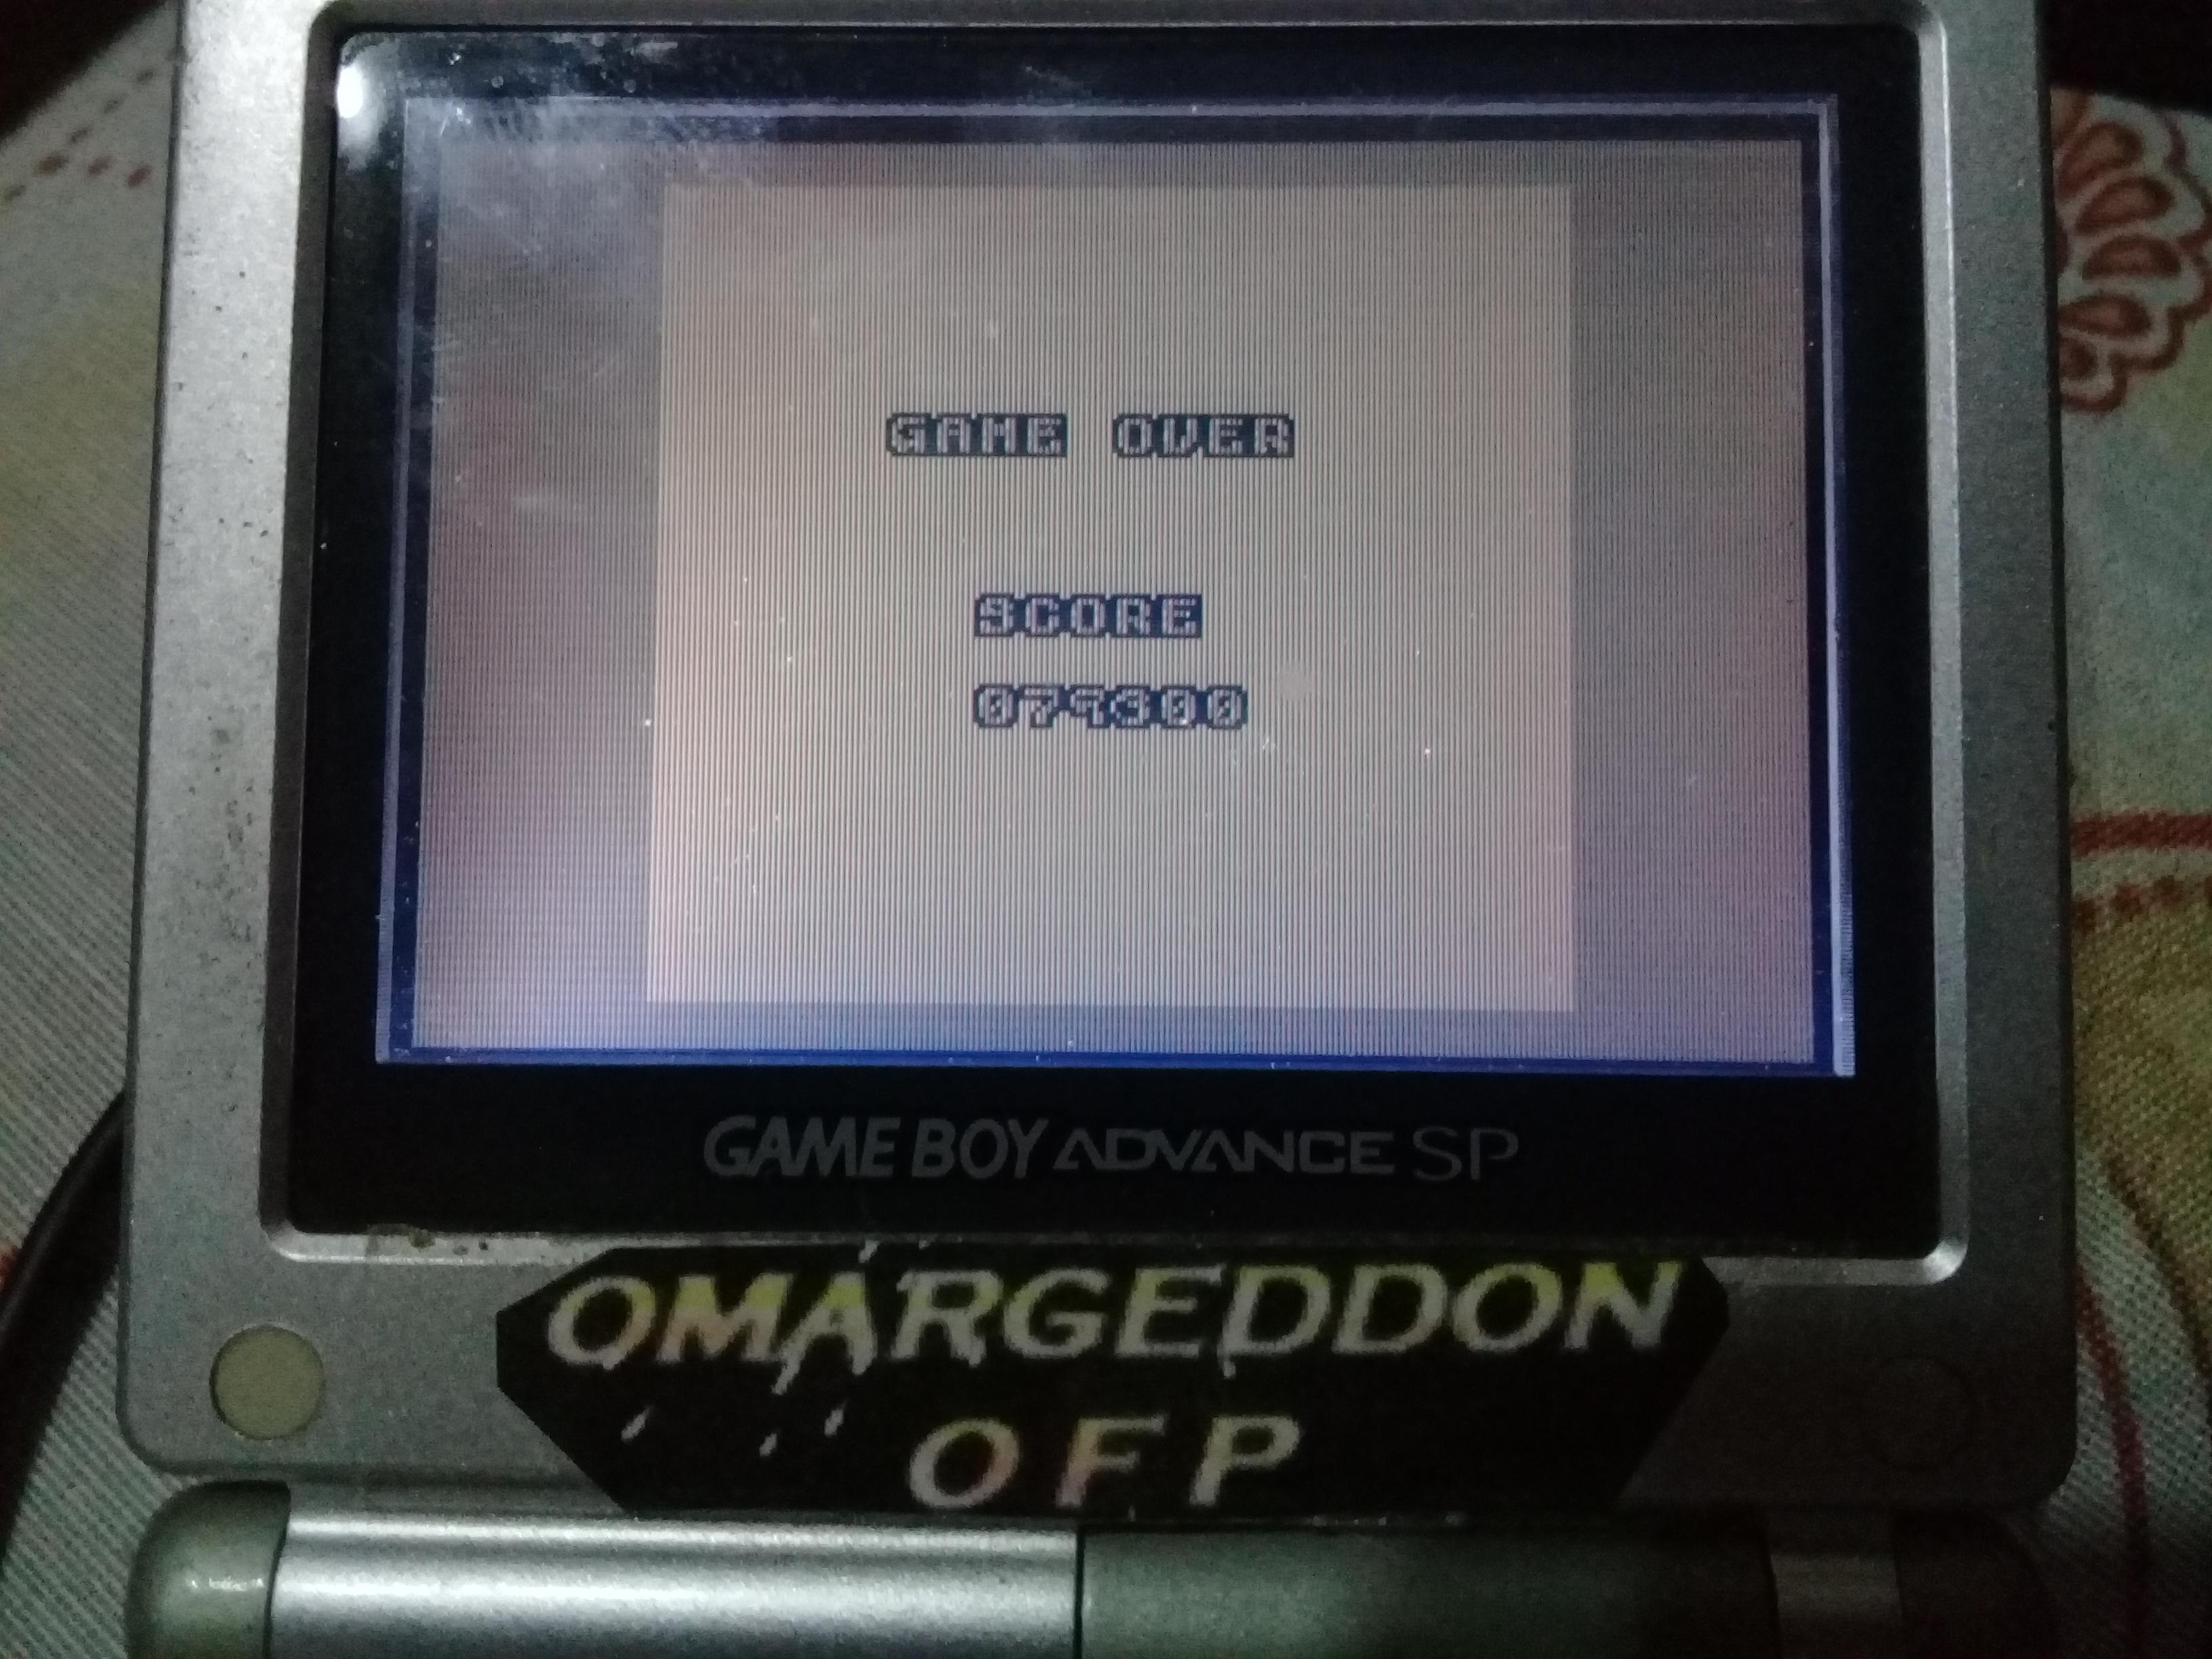 omargeddon: Joe & Mac (Game Boy) 79,300 points on 2019-07-02 09:38:50